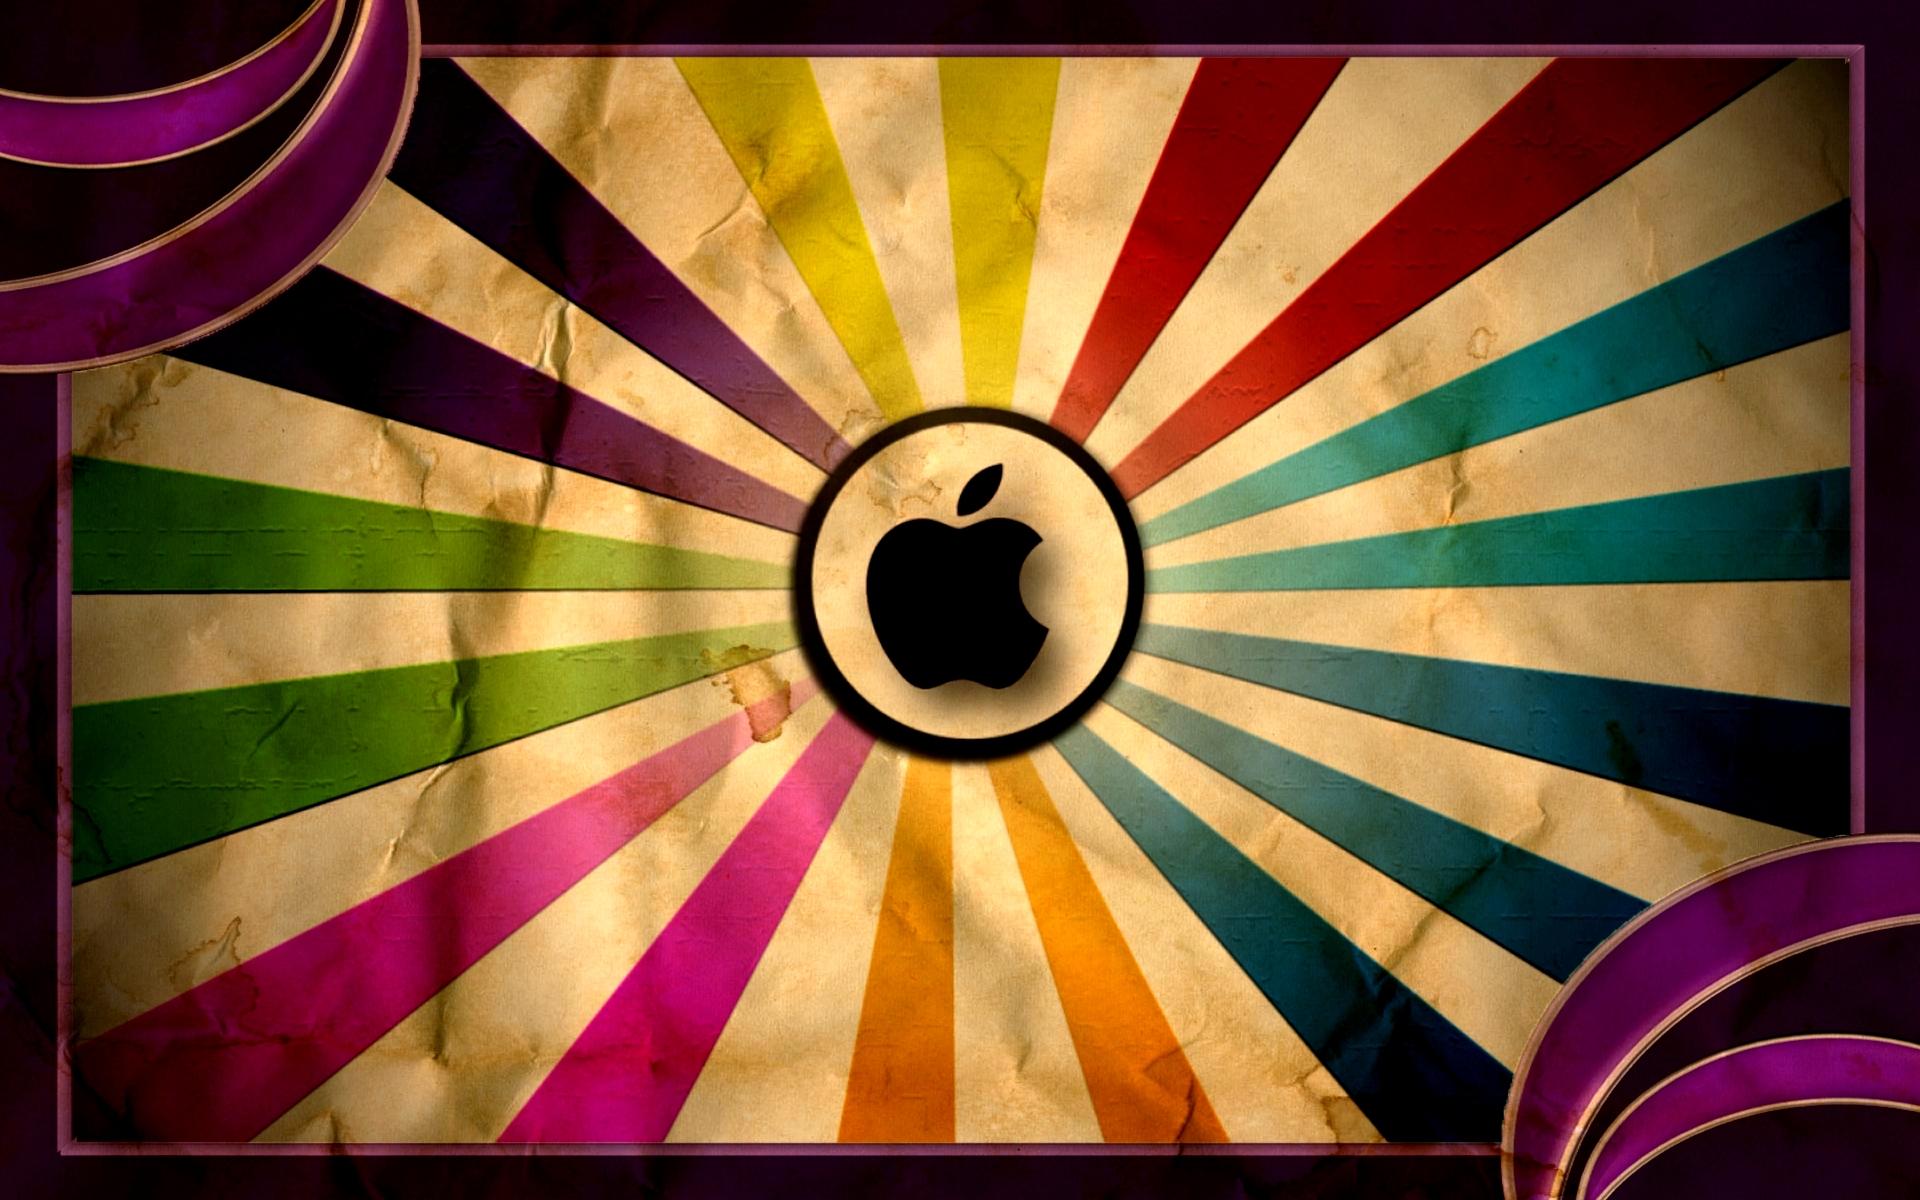 Mac Wallpaper & Picture